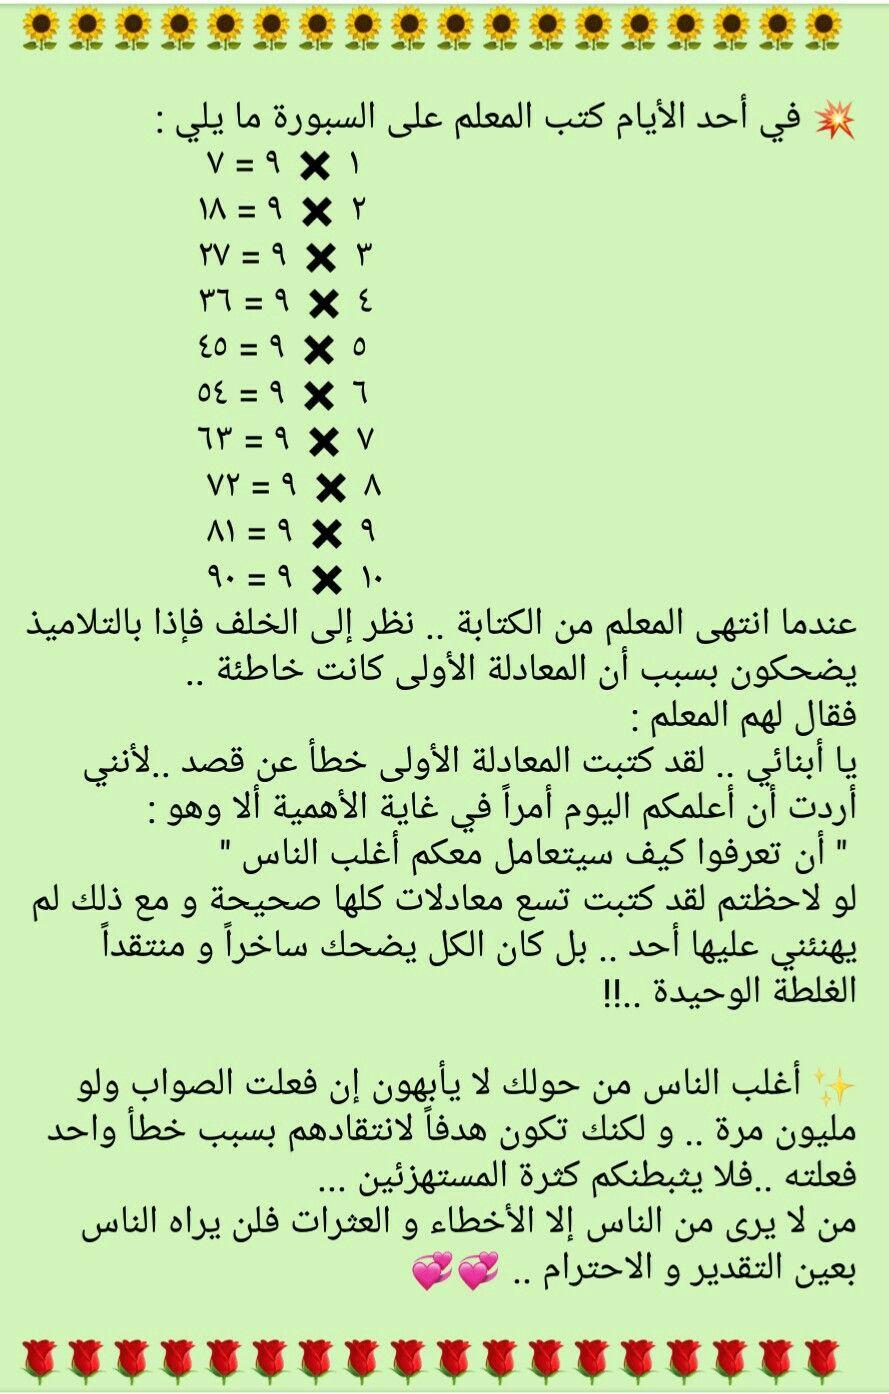 Pin By N Kindi On قصص من الحياة Funny Arabic Quotes Beautiful Arabic Words Life Quotes